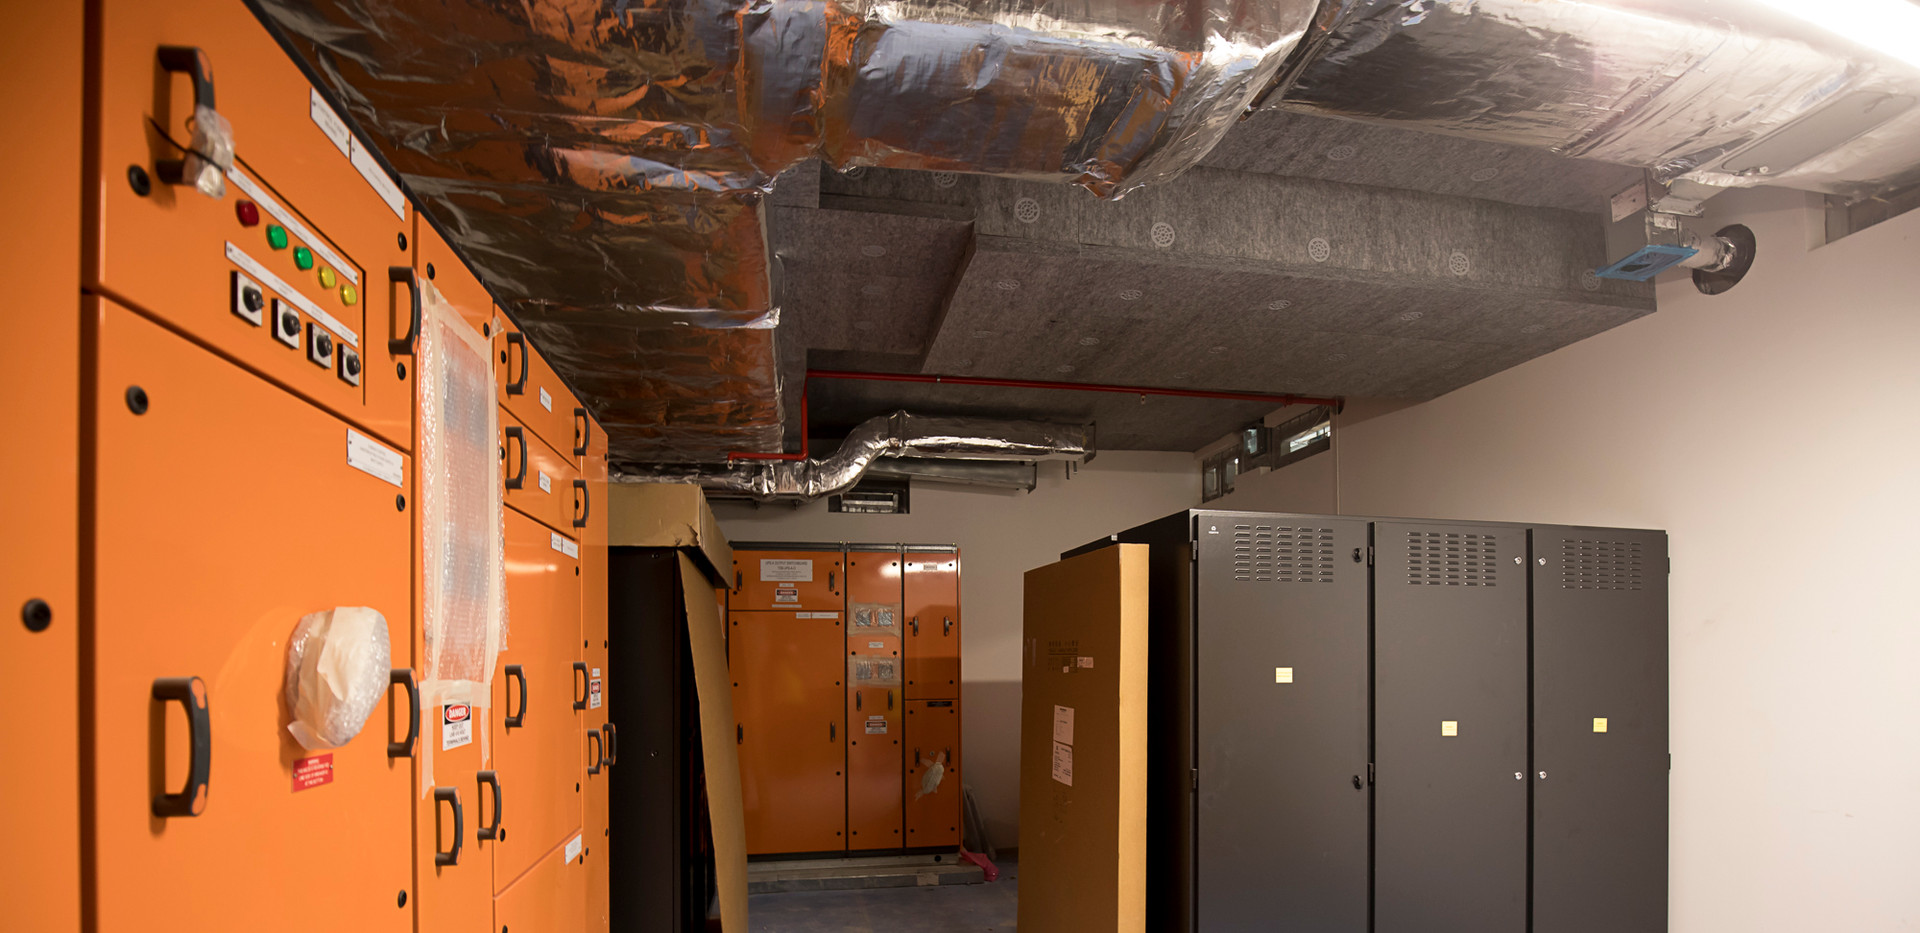 2020_03_23_Tower Level 4 UPS Room.jpg